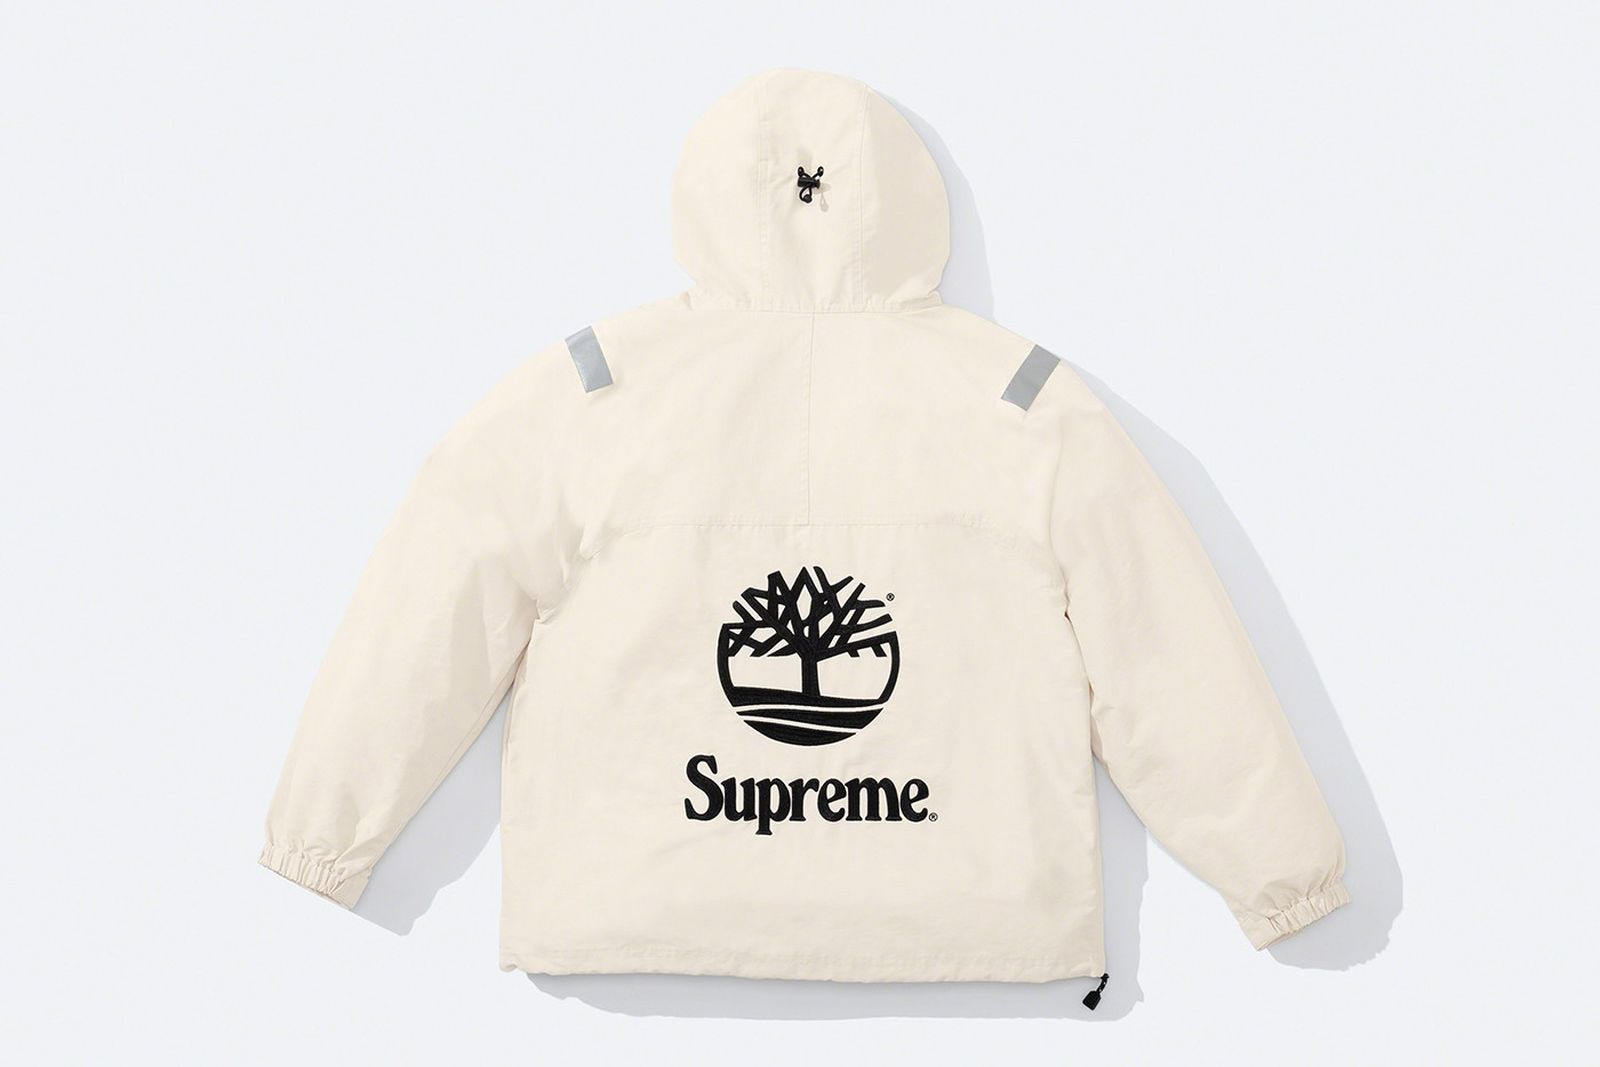 supreme-x-timberland-collaboration-ss-21-14